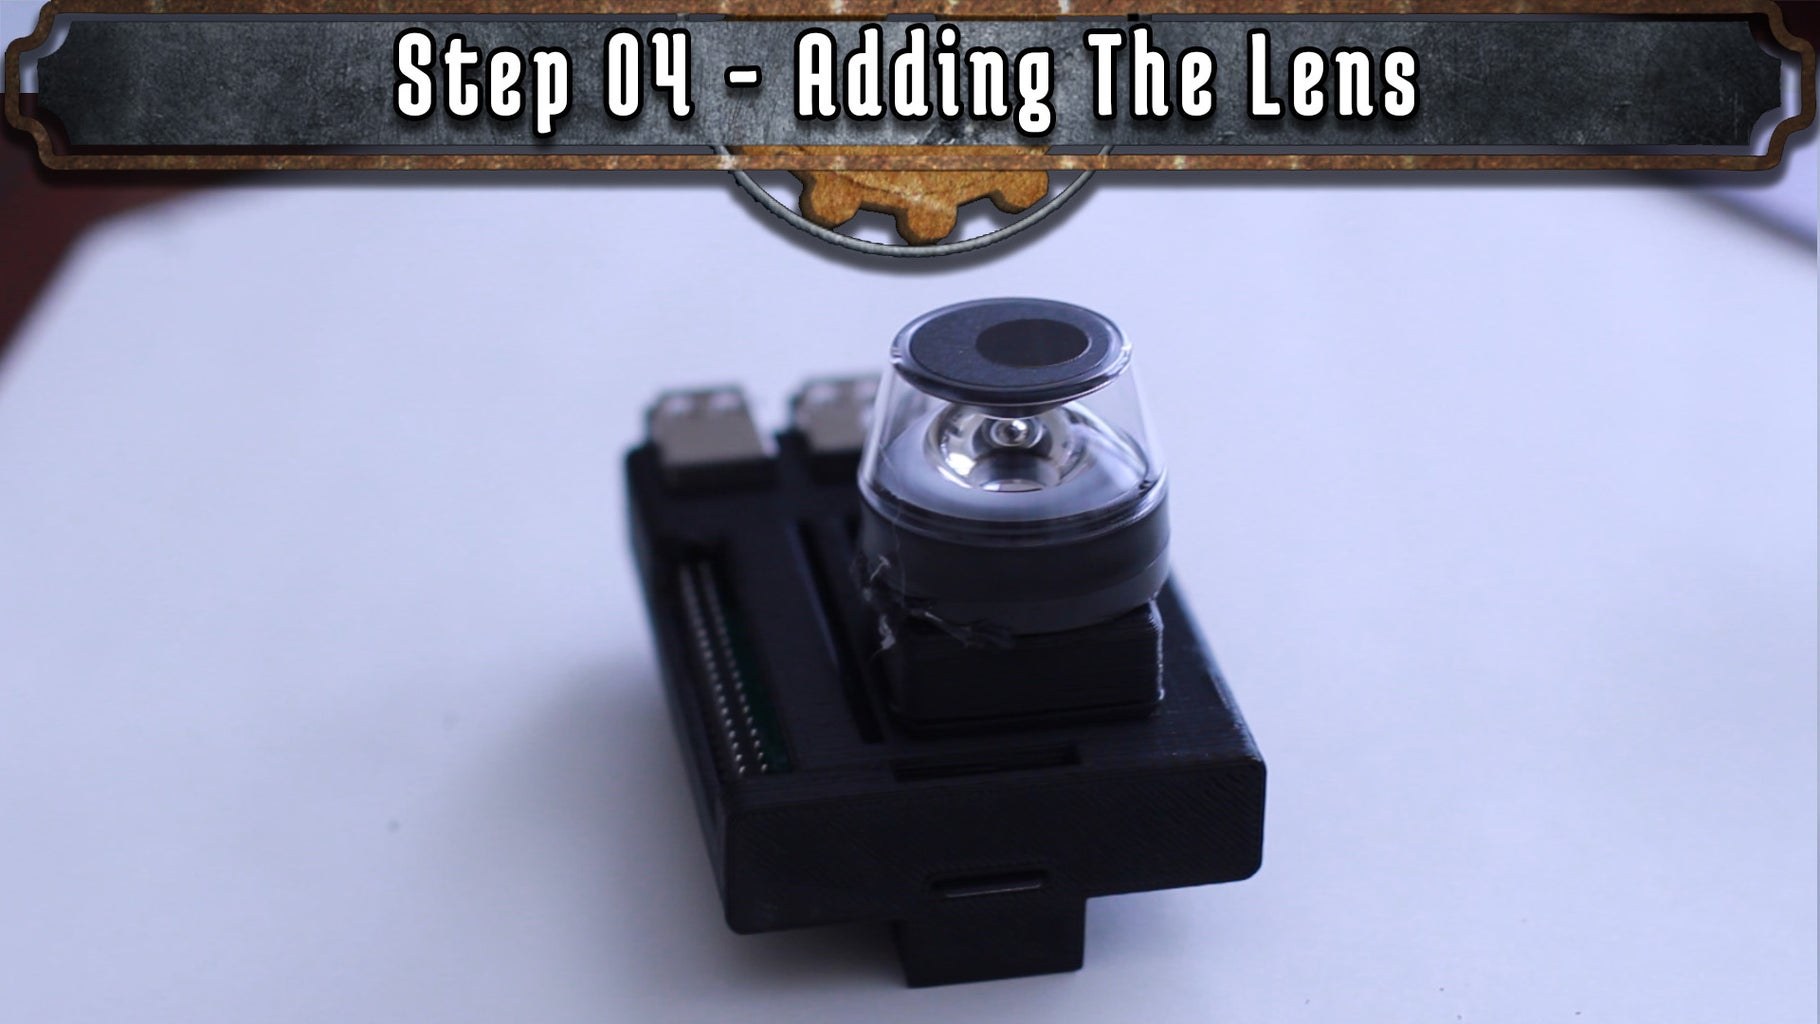 Adding the Lens